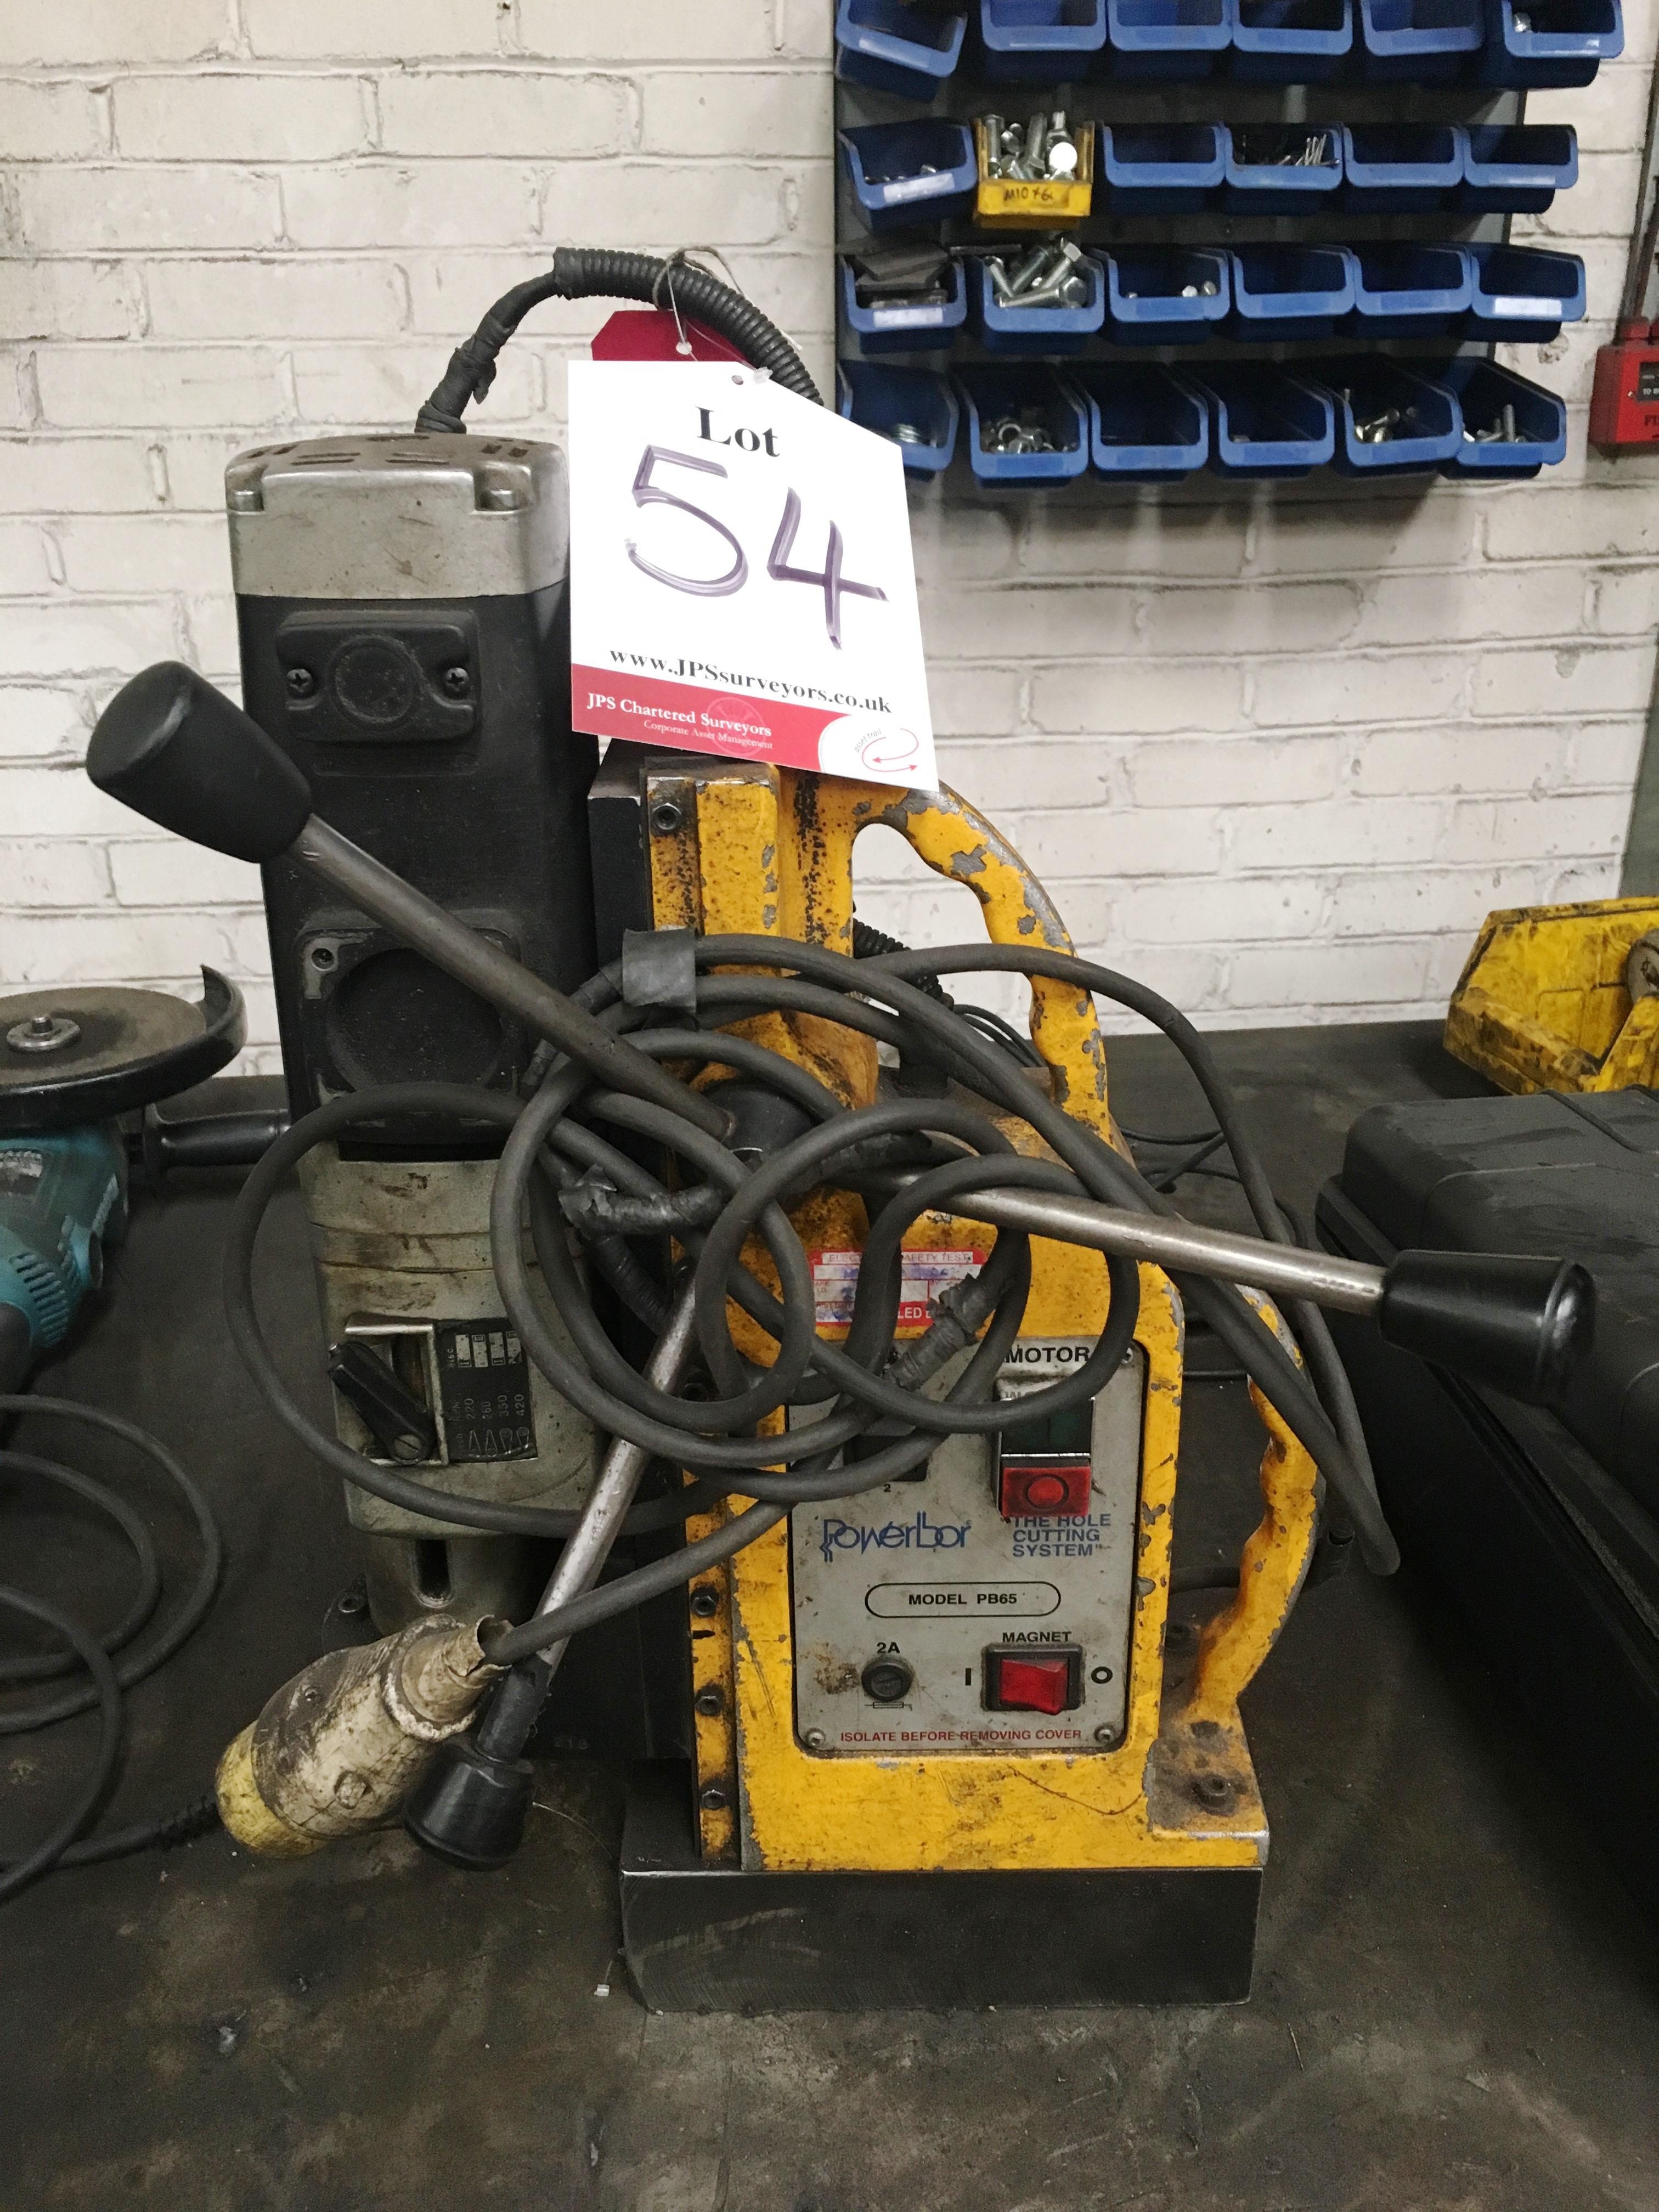 Lot 54 - Powerbor PB65 Magnetic Drill